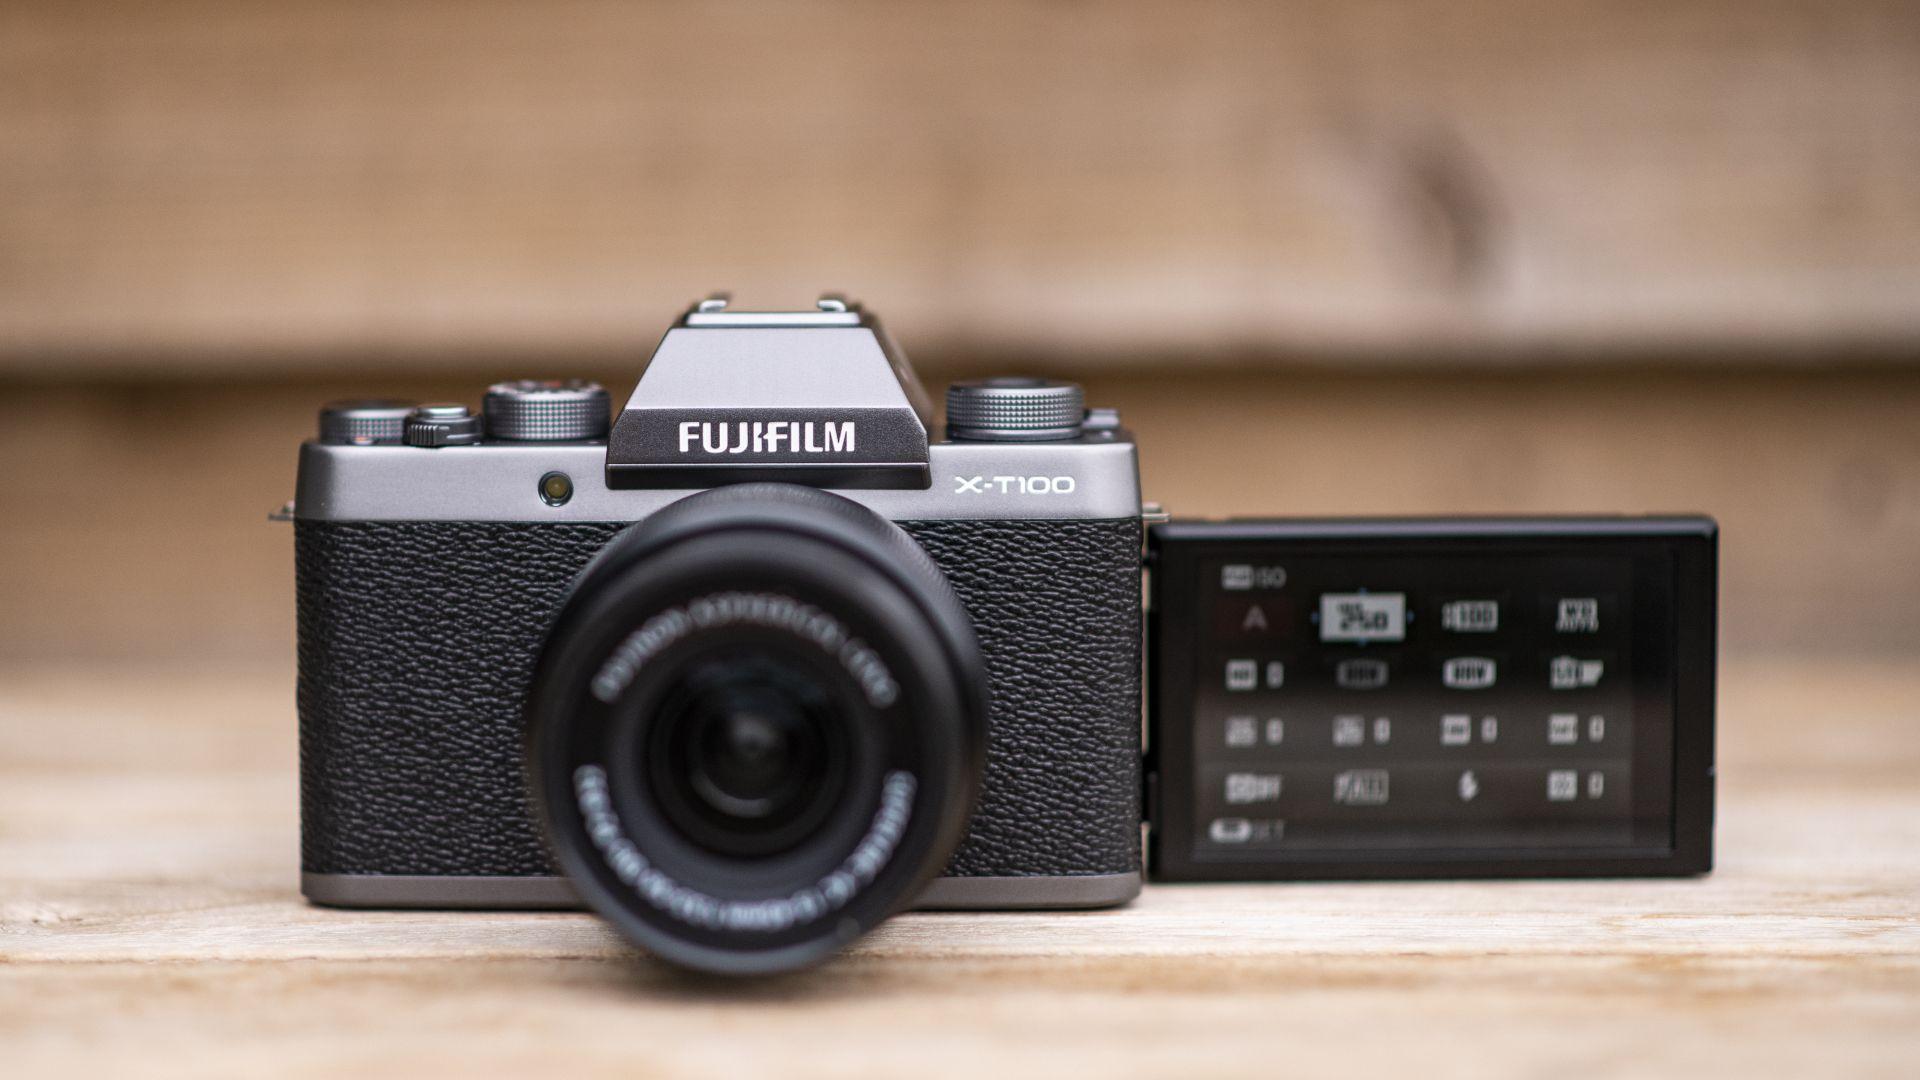 قیمت دوربین فوجی X-T100 with15-45mm